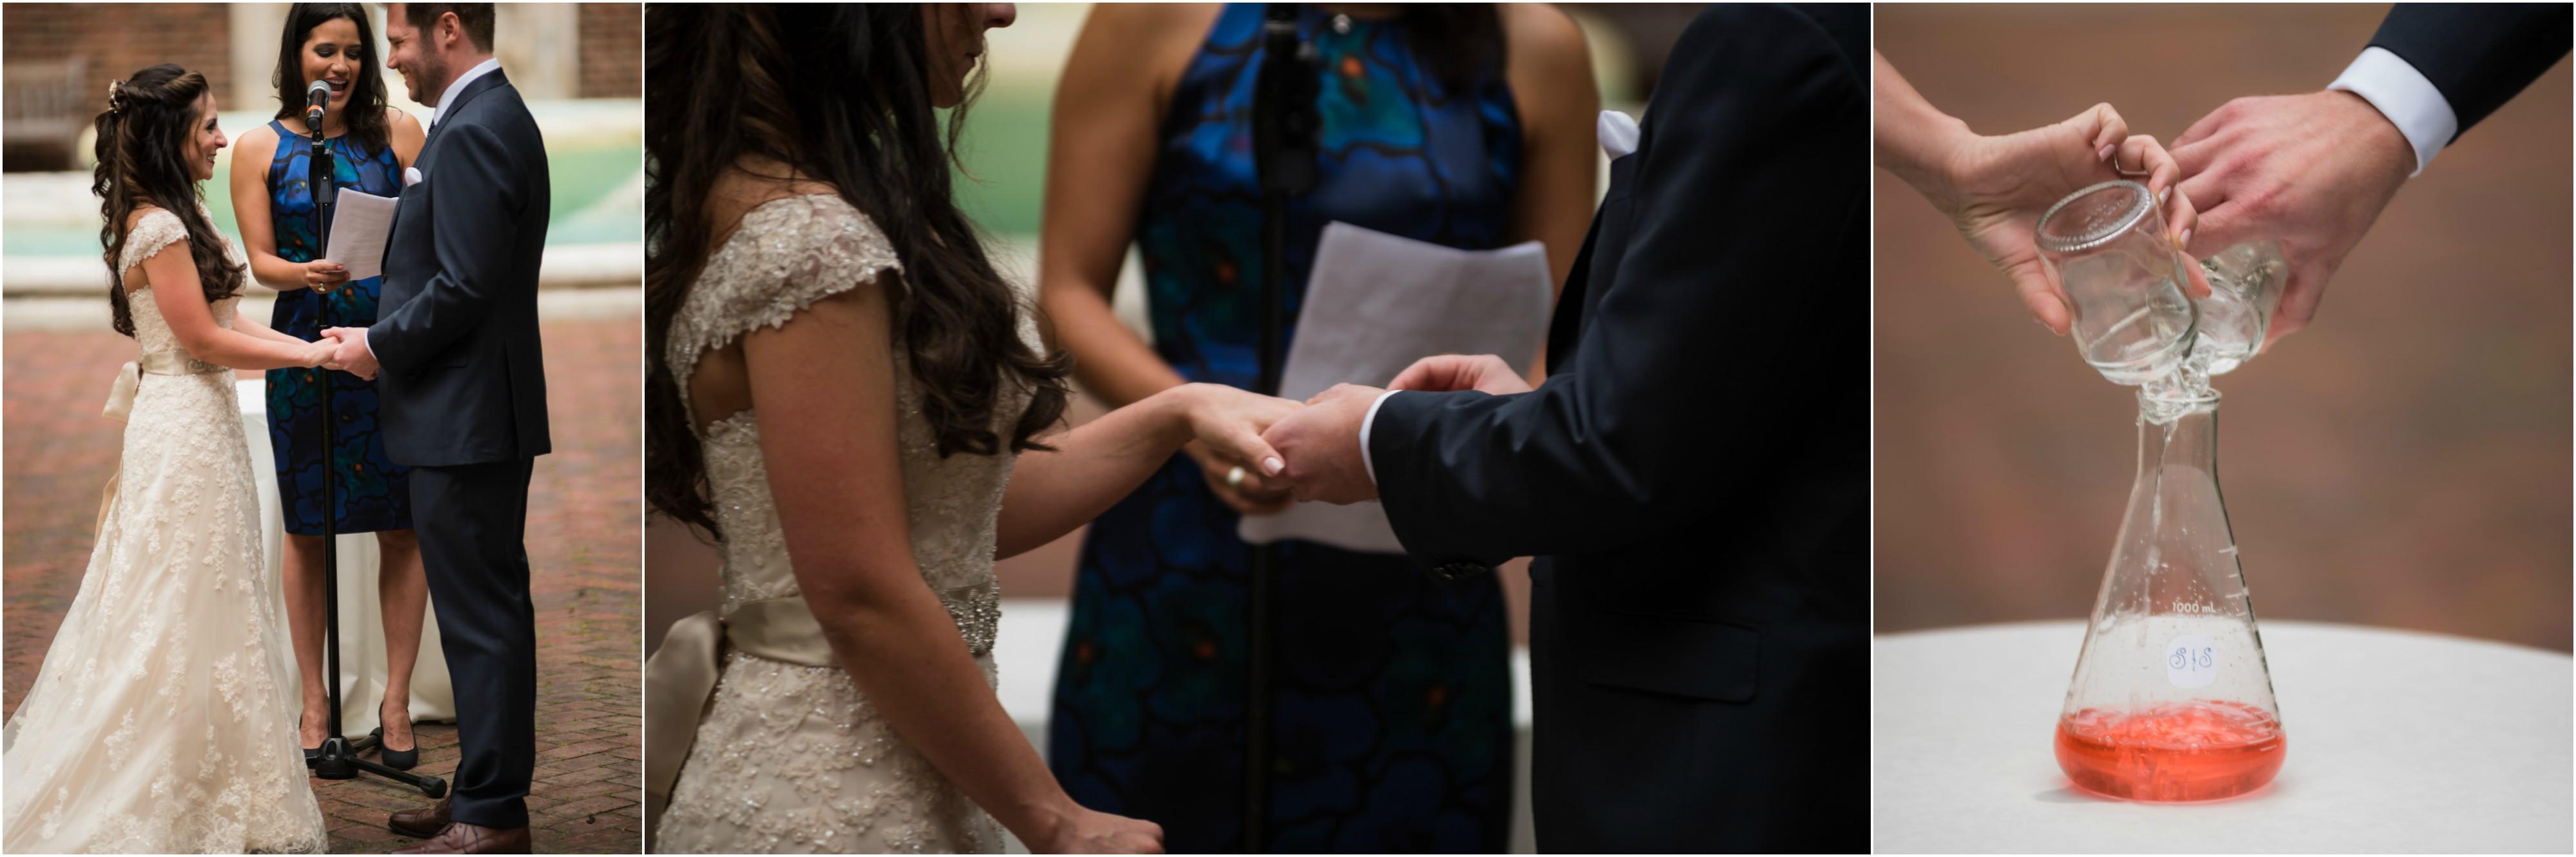 Black White Raw Photography Philadelphia Photographer Philly In Love Philadelphia Weddings2